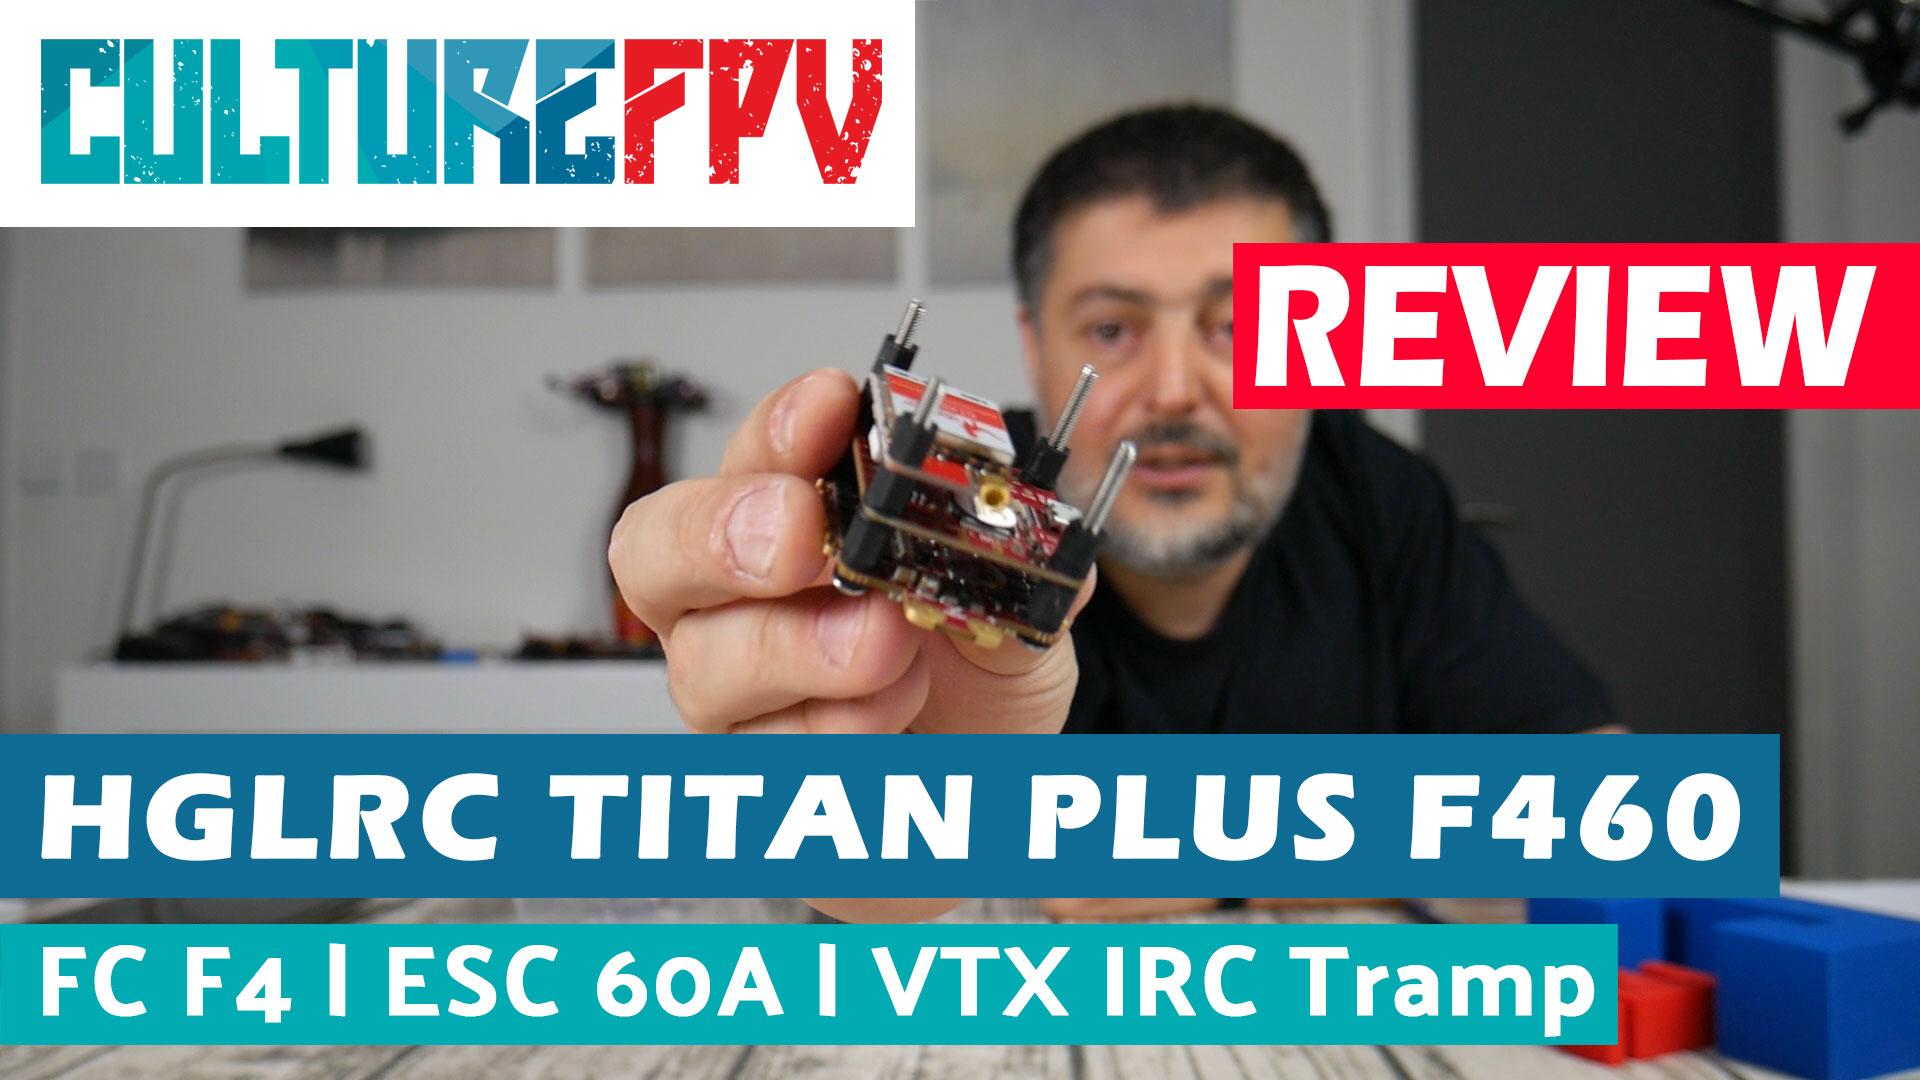 HGLRC Titan plus